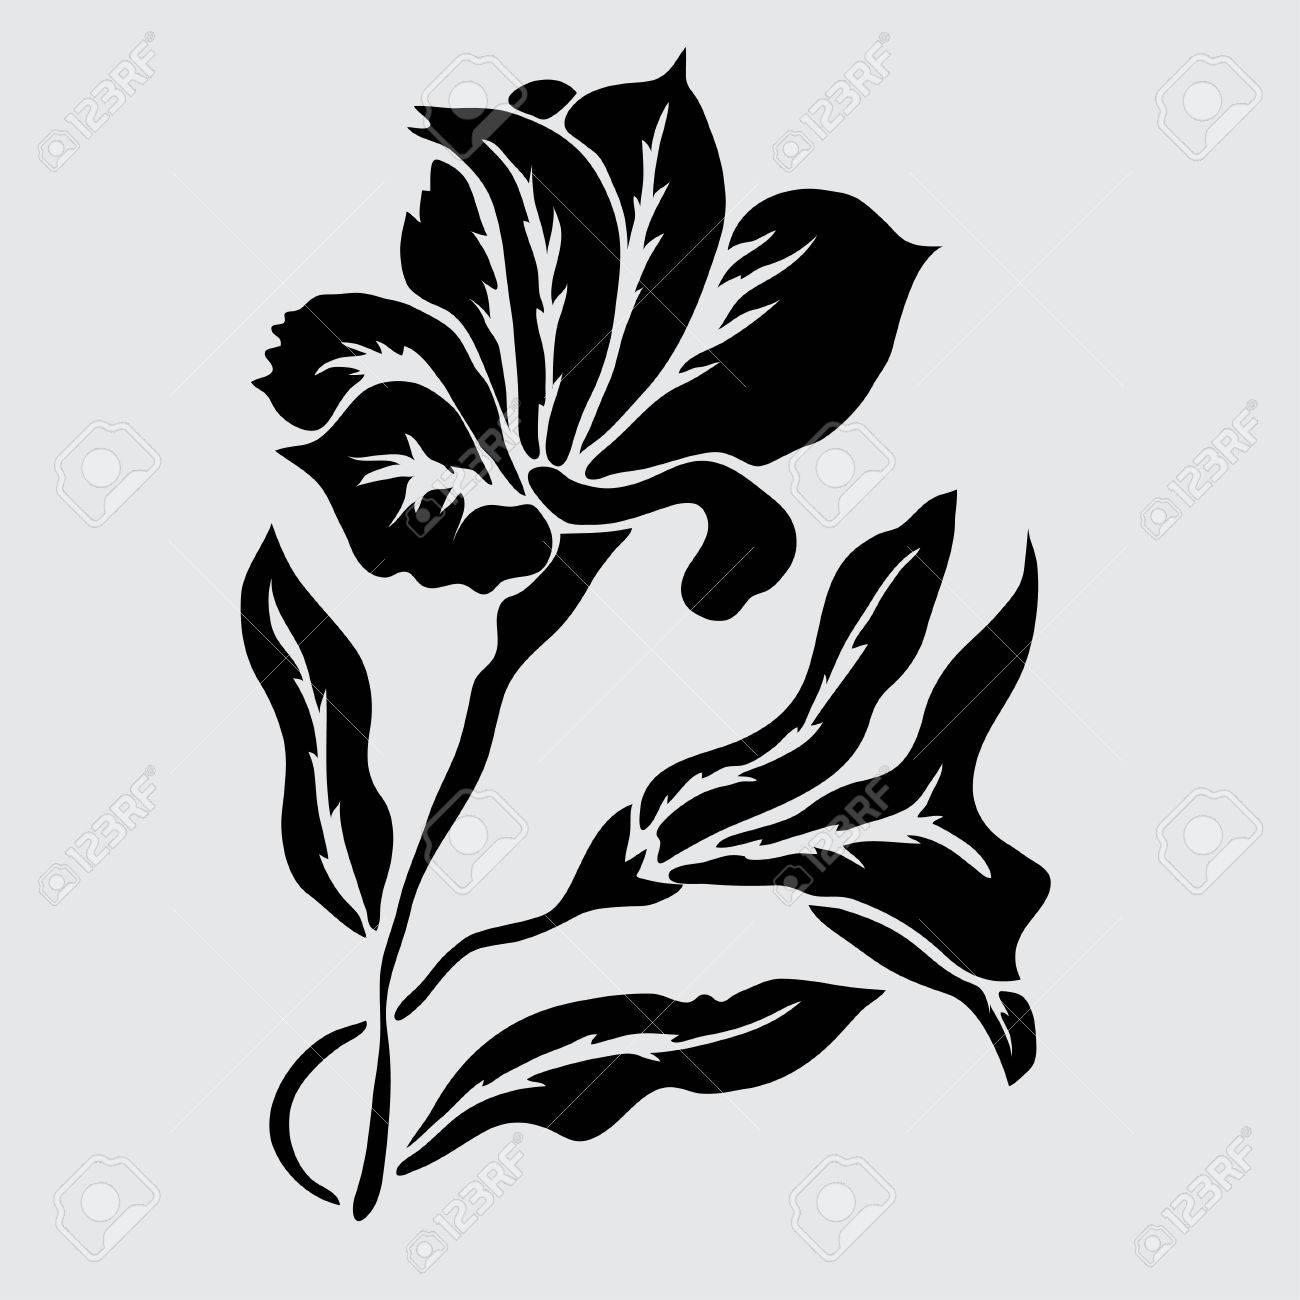 Elegant decorative lily flowers design element floral branch elegant decorative lily flowers design element floral branch floral decoration for vintage wedding dhlflorist Images